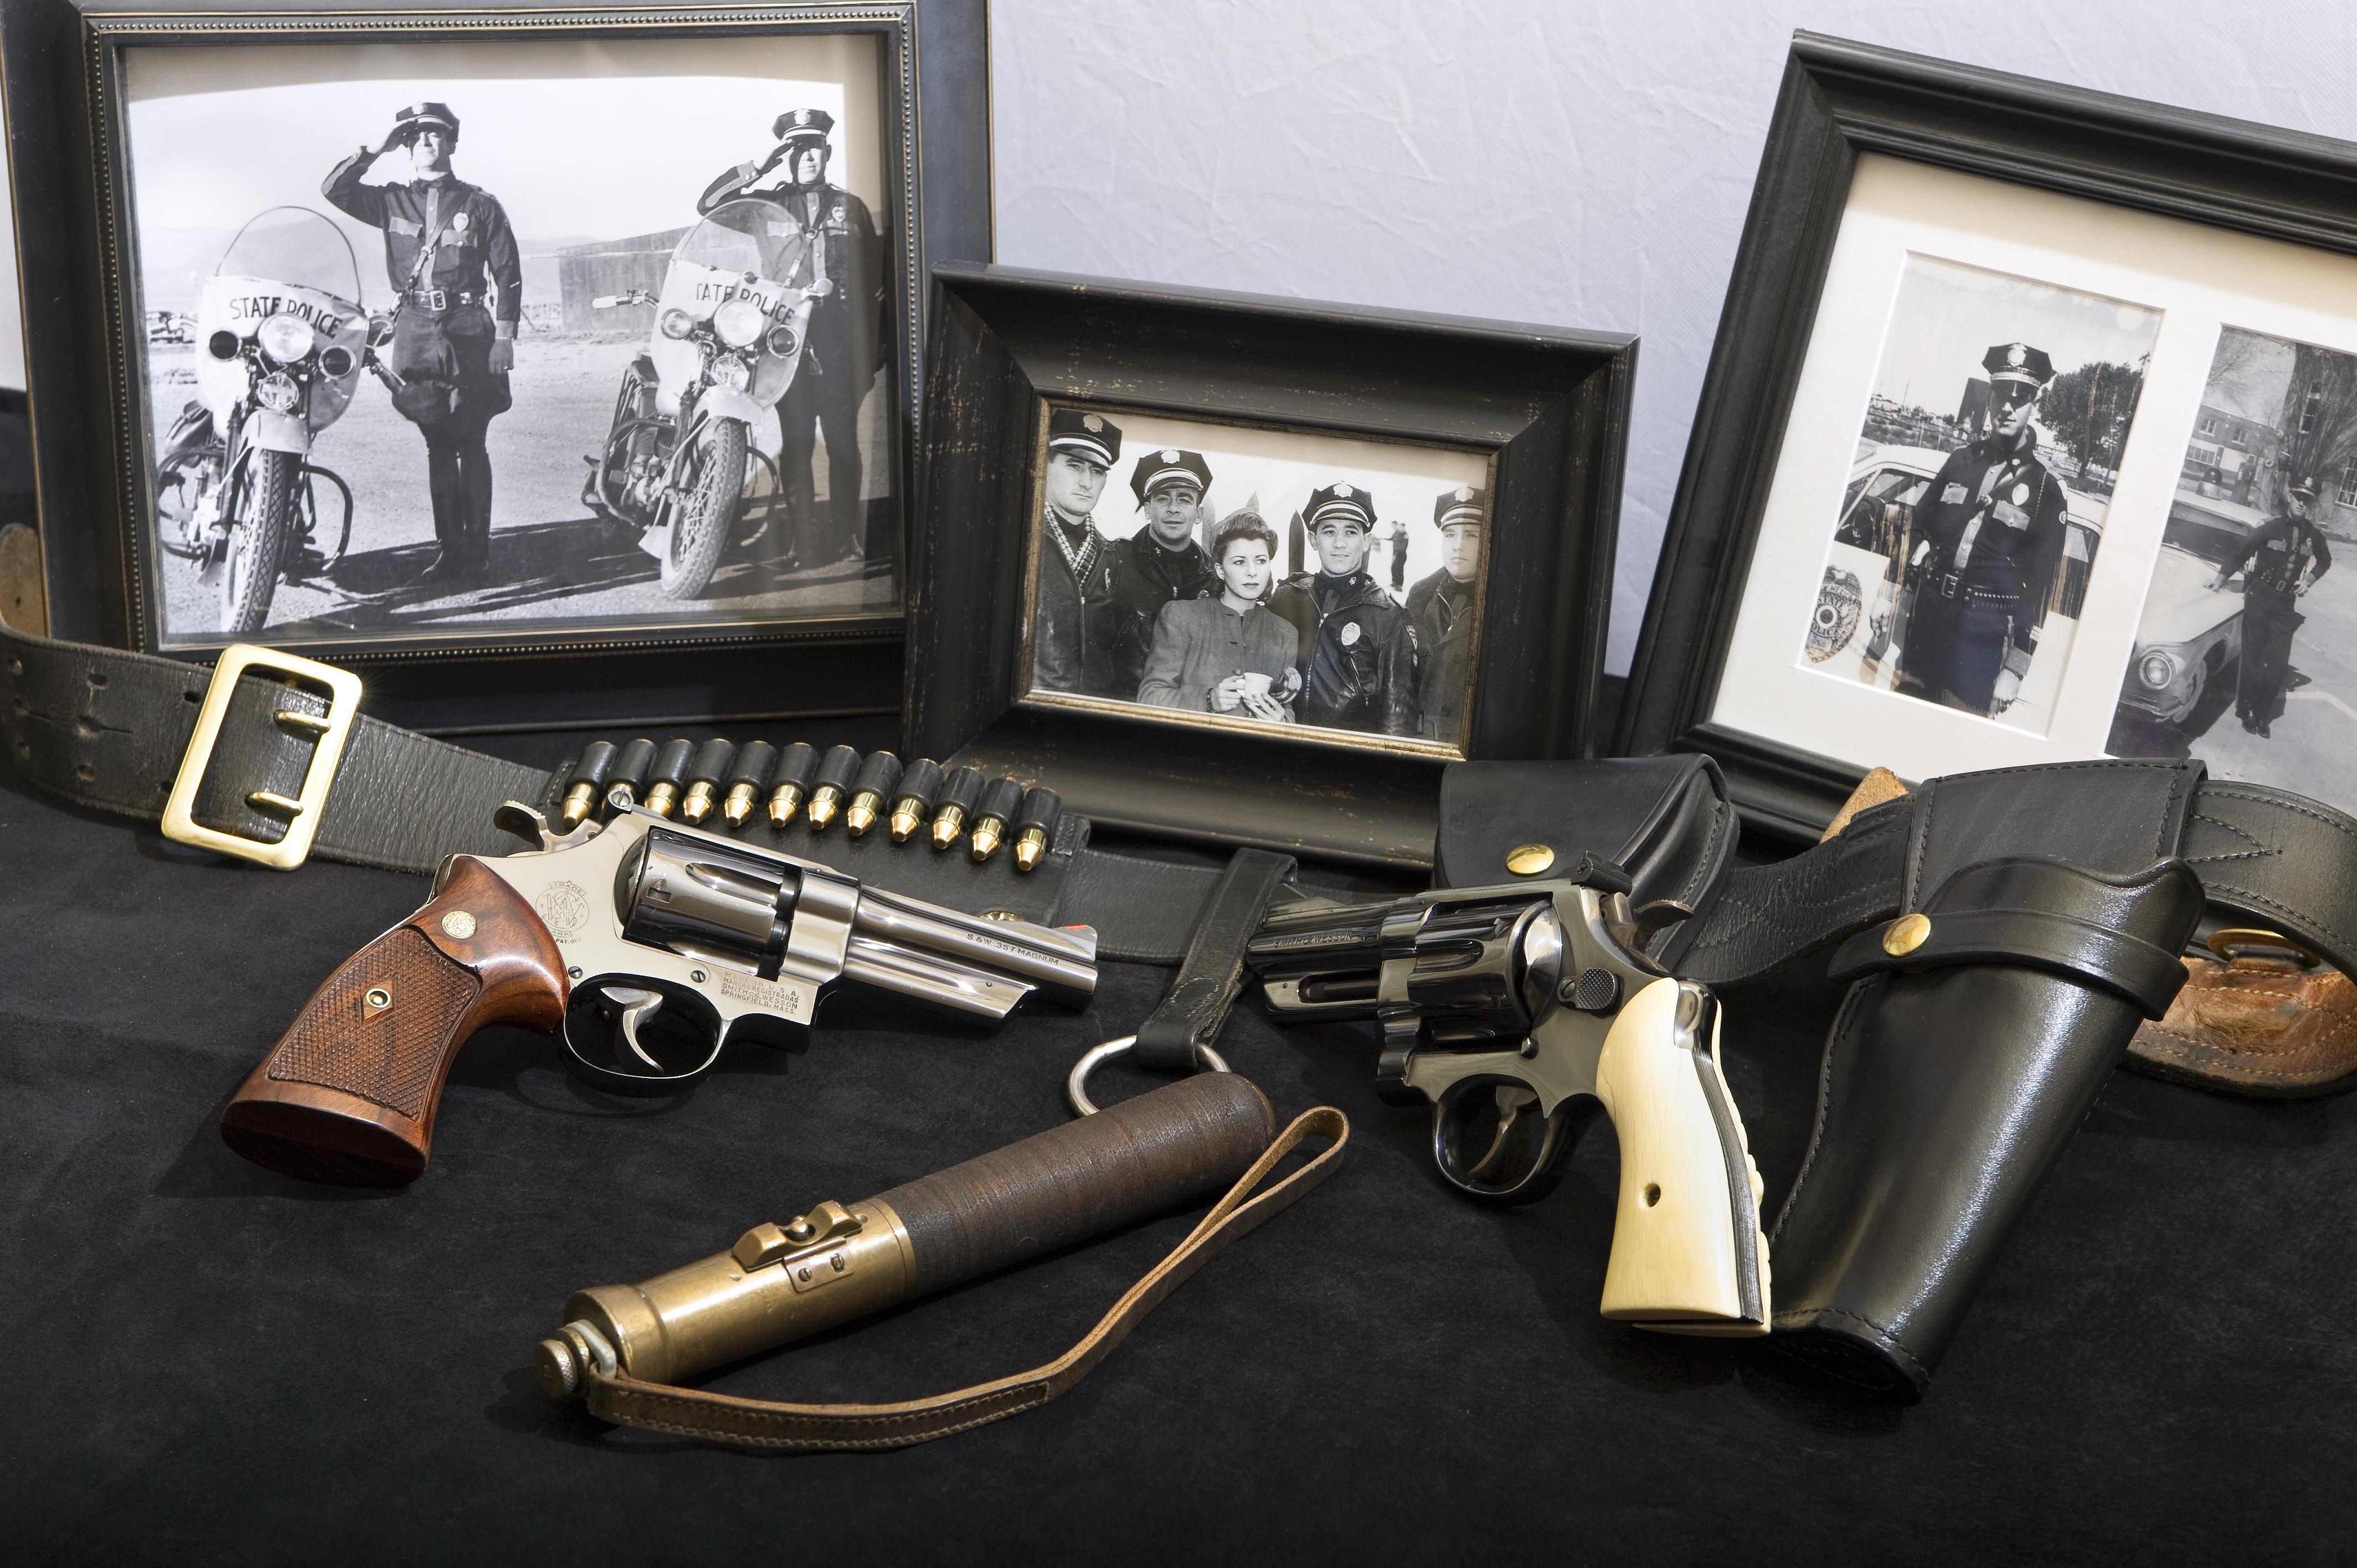 Wheelgun Wisdom: Running Double-Action Revolvers | S.W.A.T. Magazine